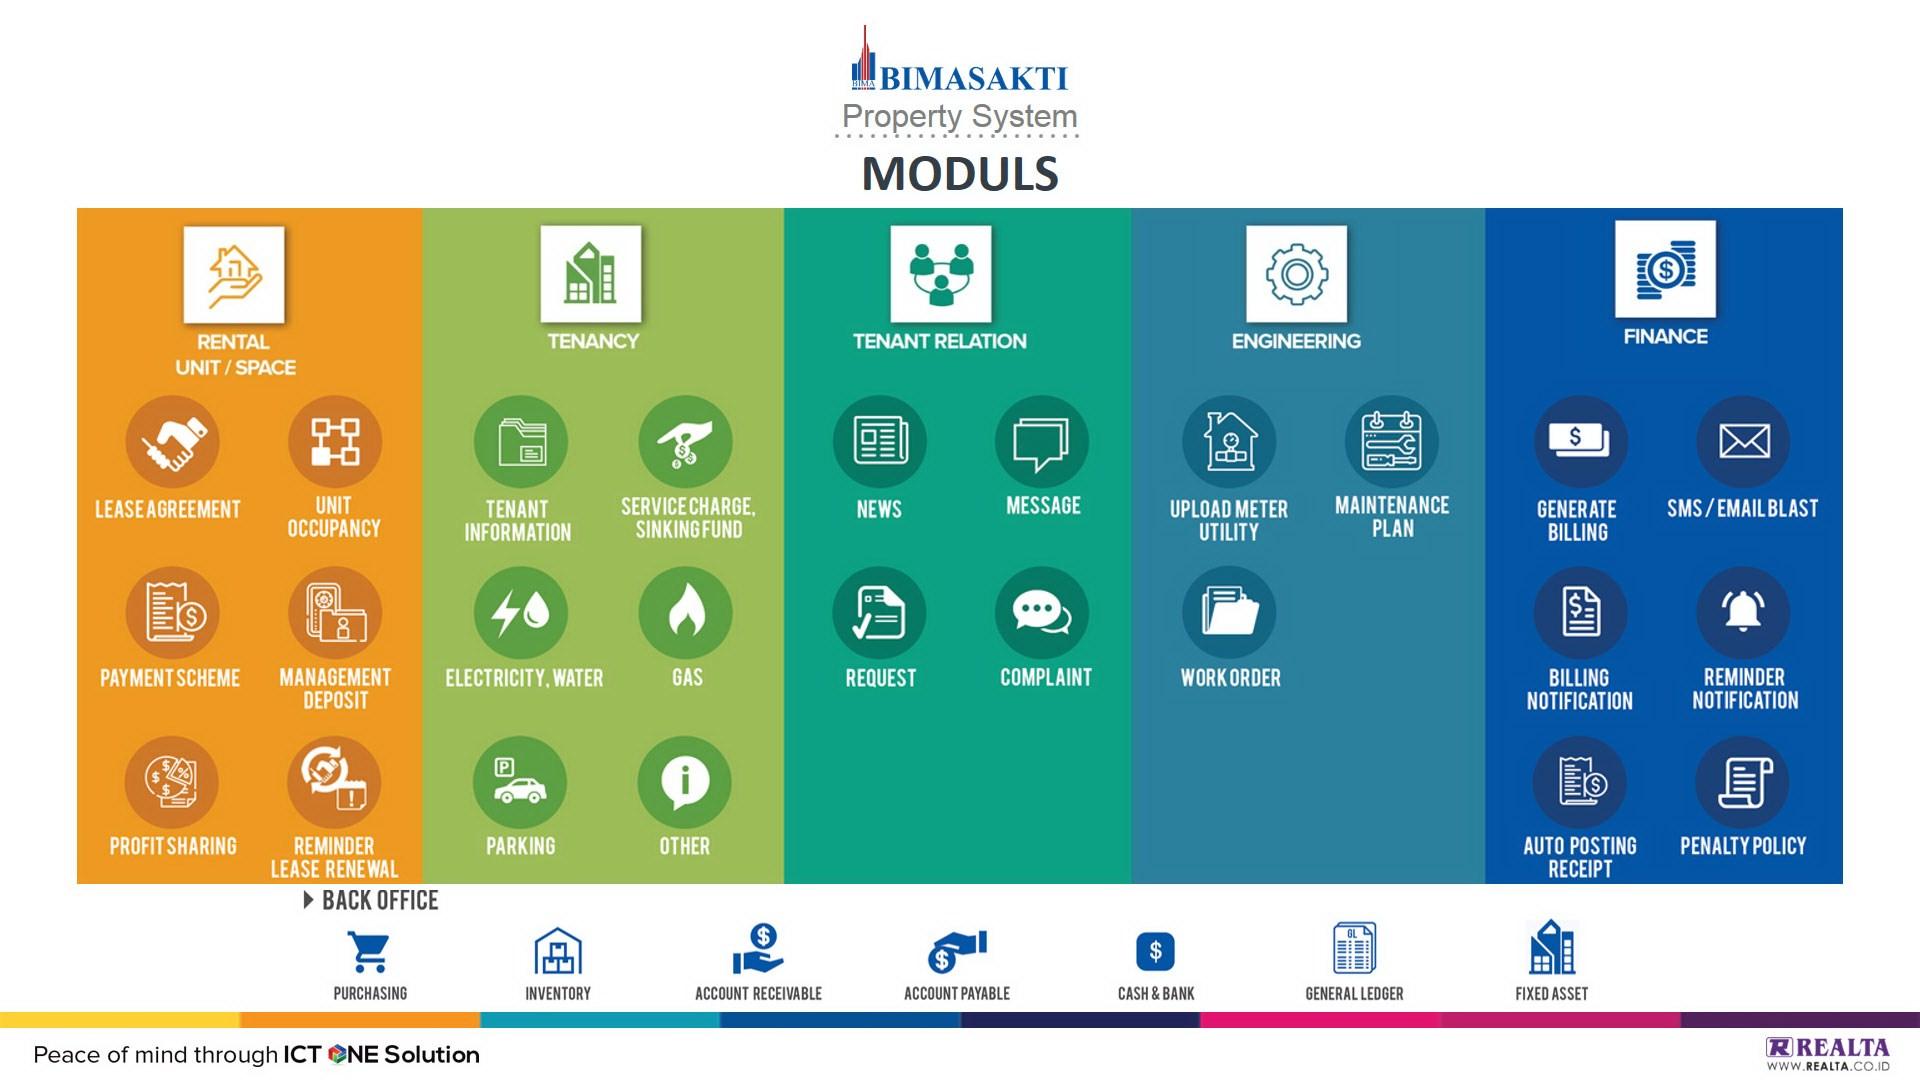 Bimasakti Property and Tenancy Management System